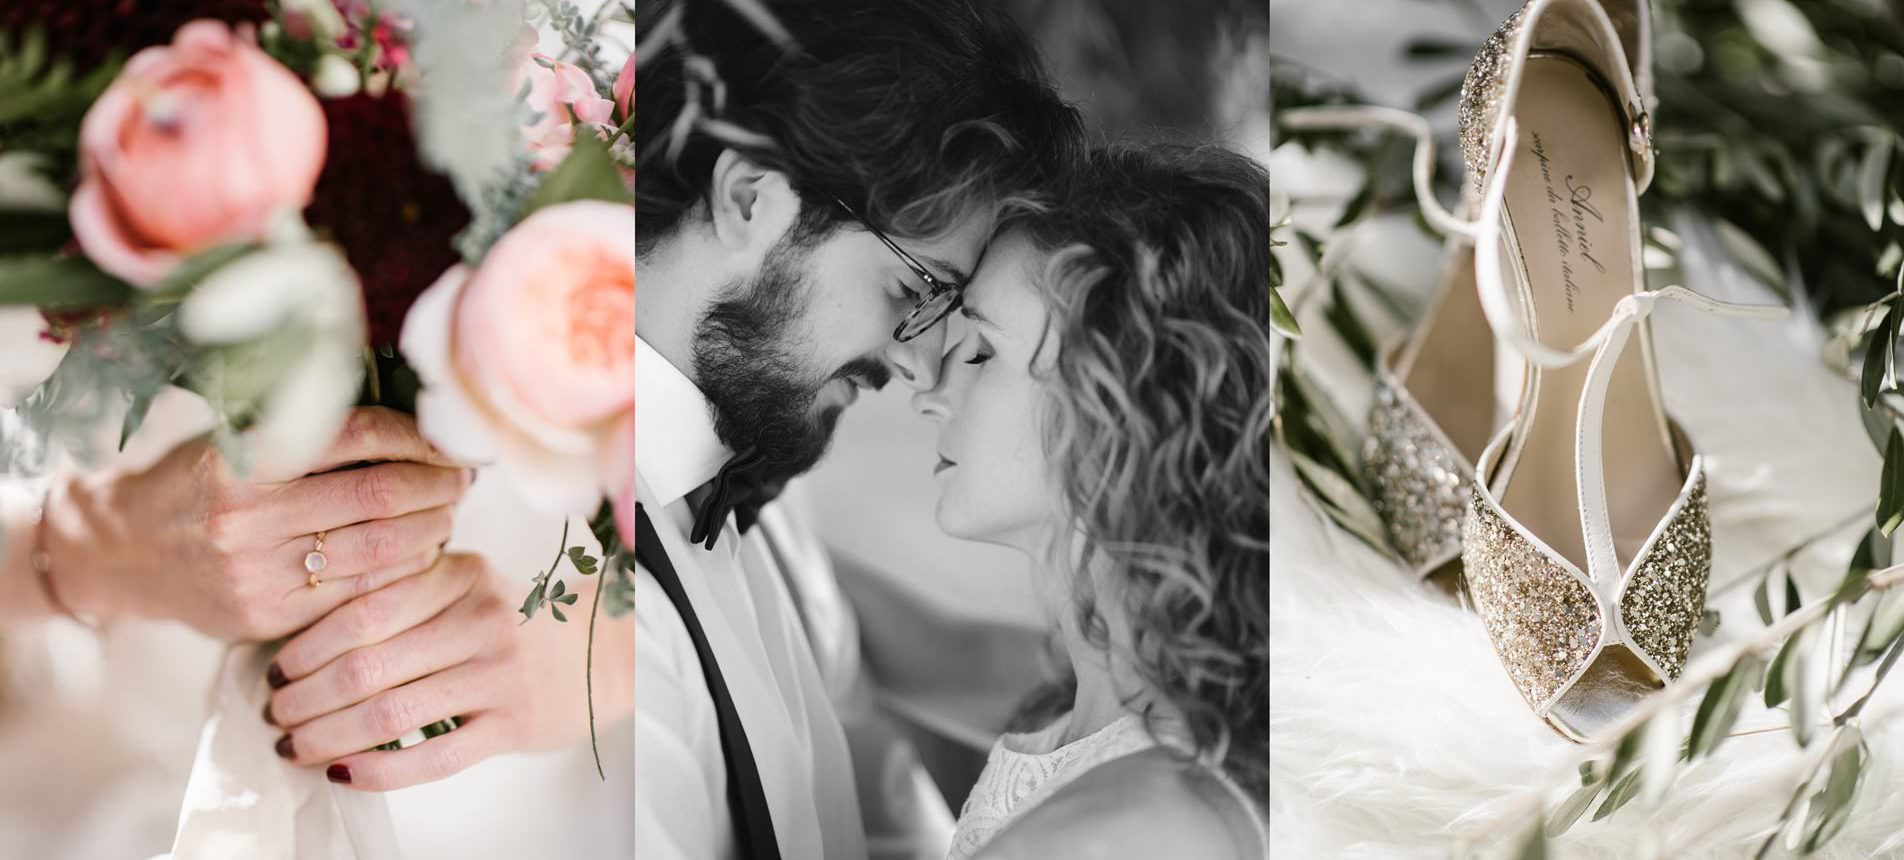 photographe mariage geneve monika breitenmoser